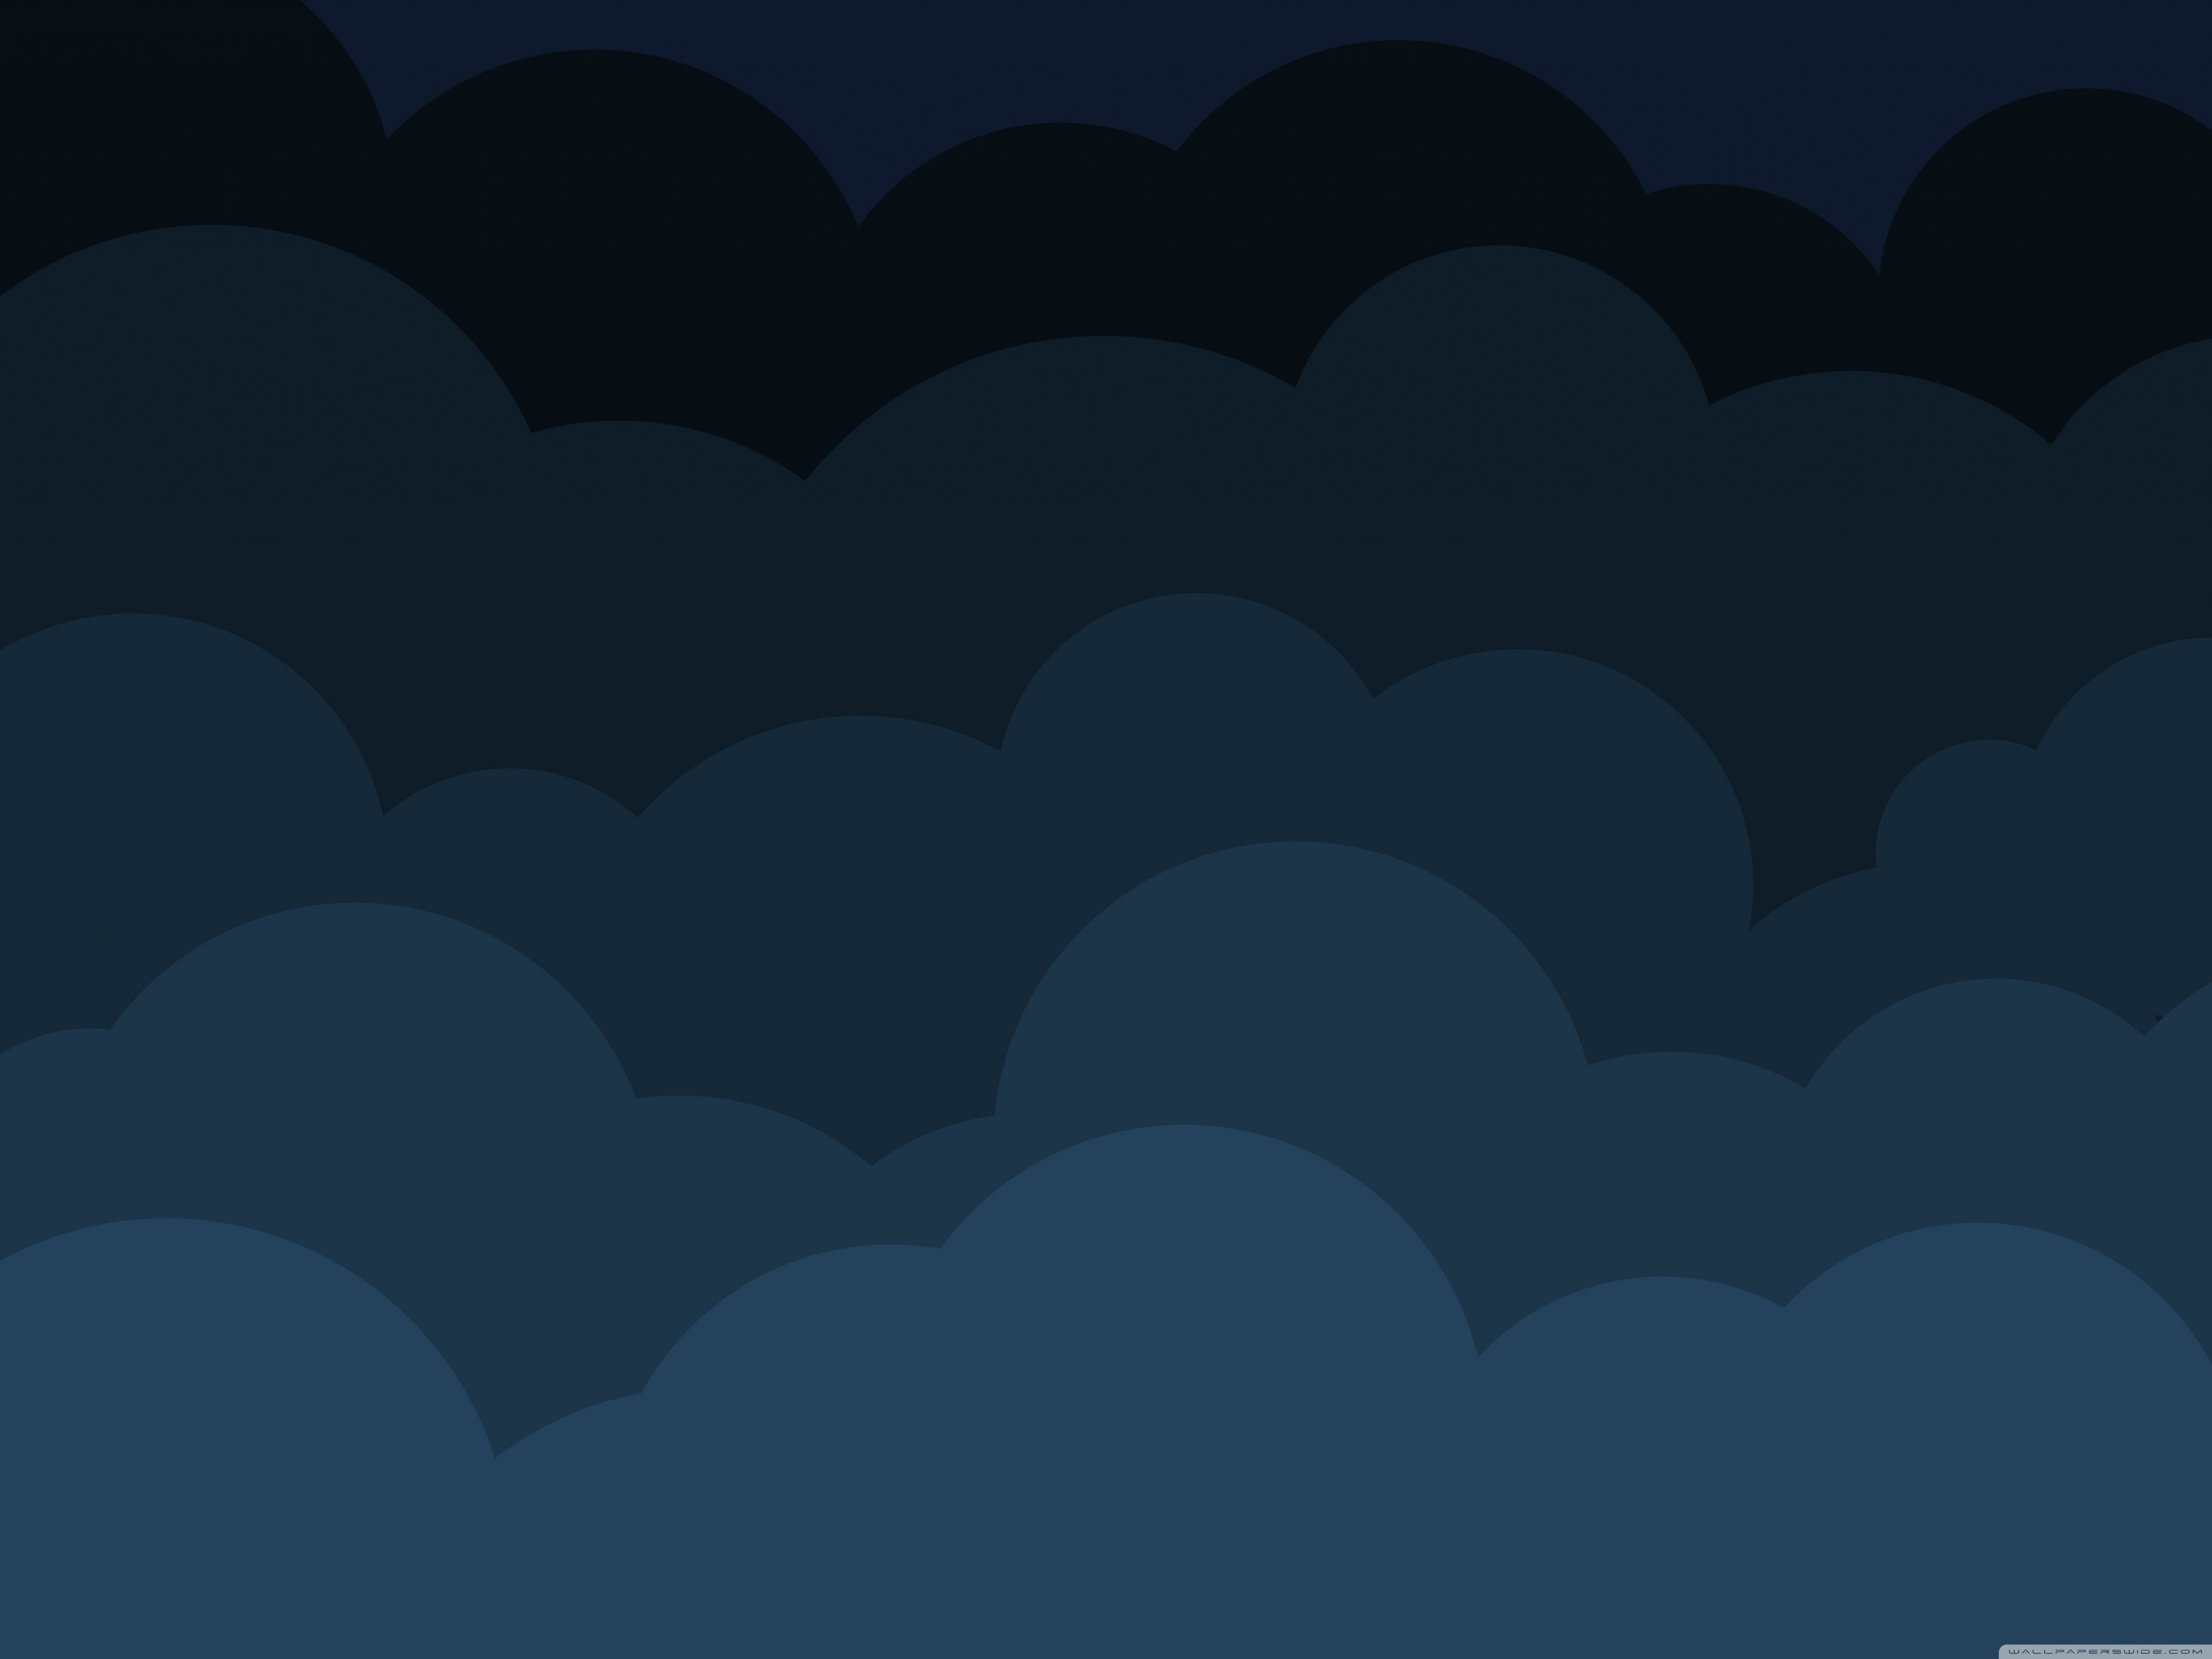 Download Free WallpaperDark Cartoon Clouds